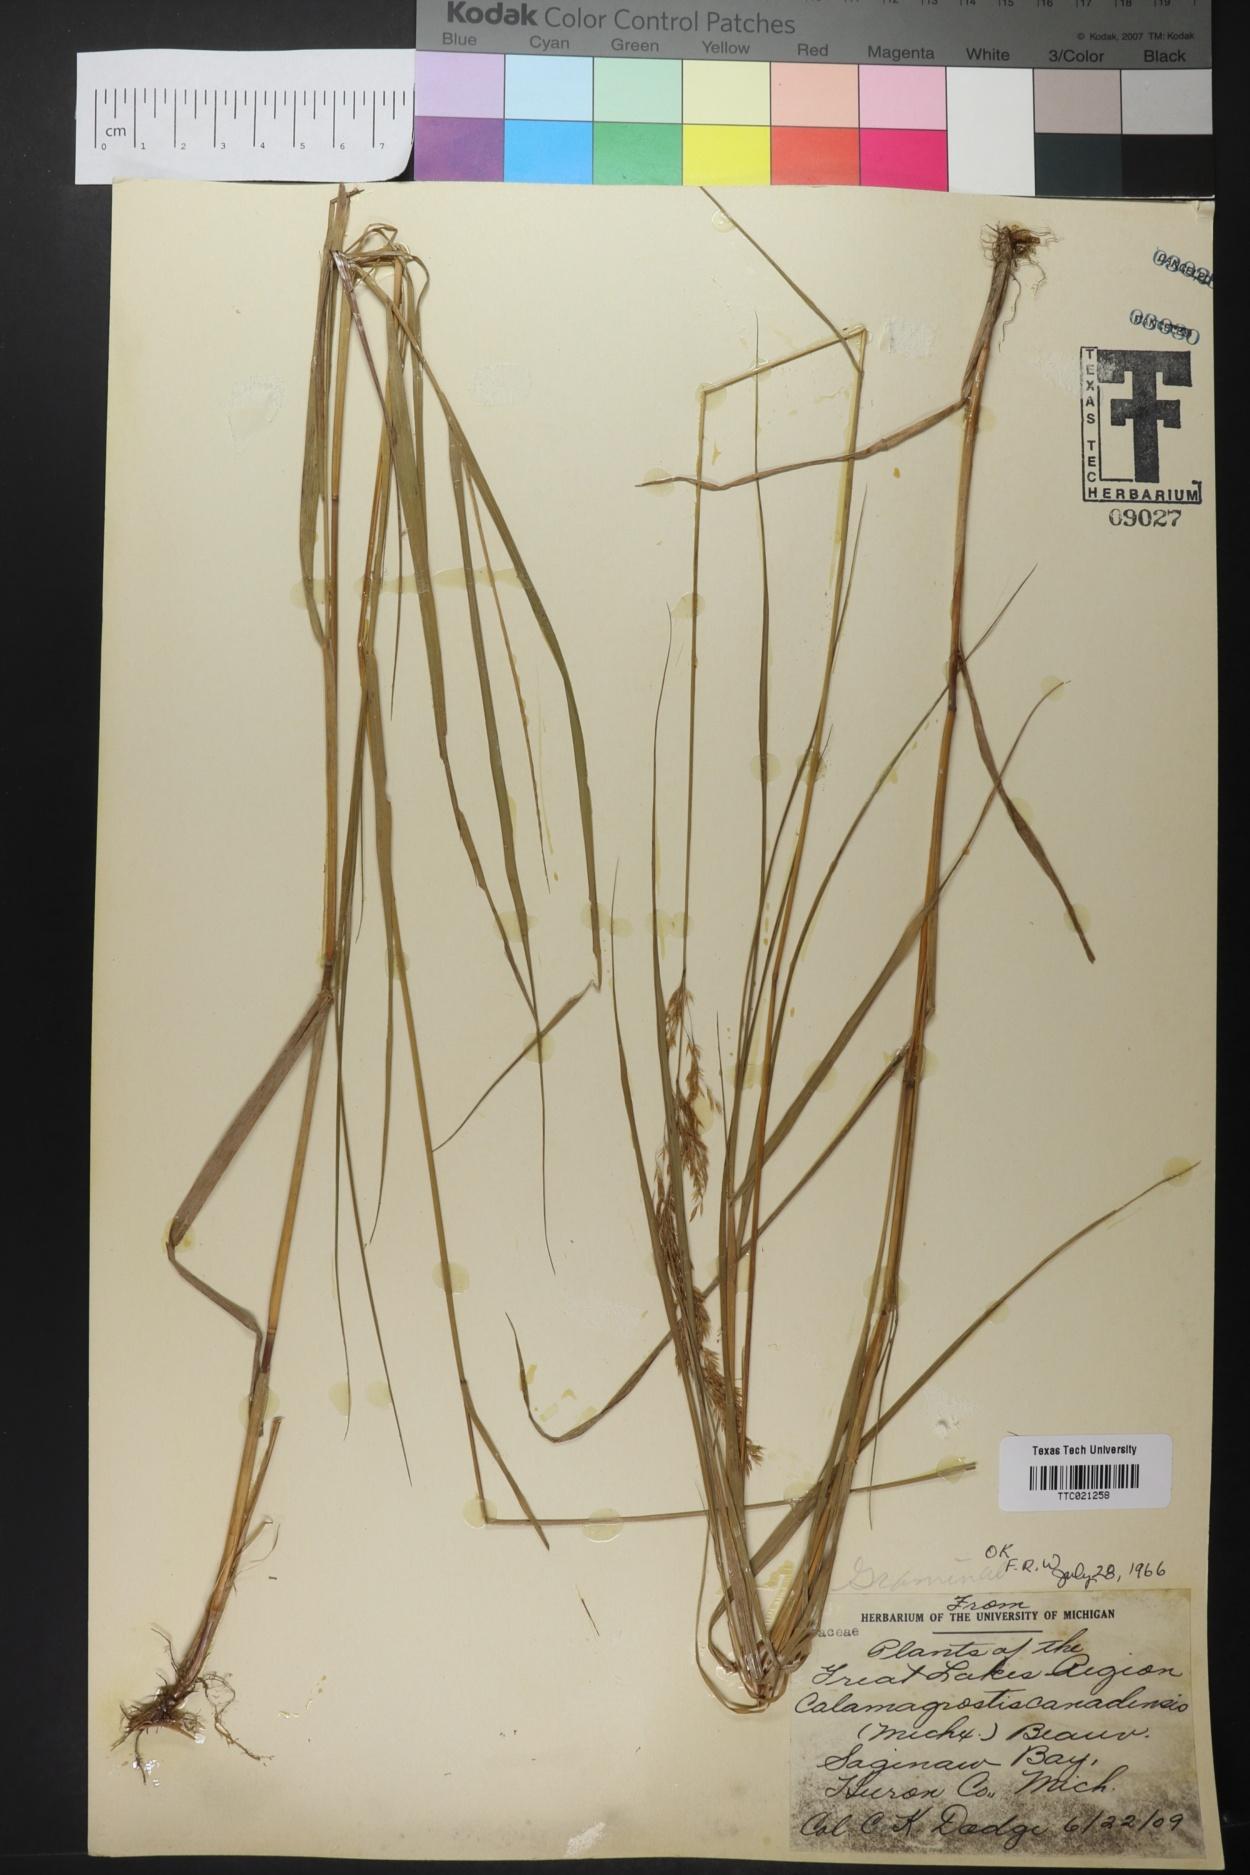 Calamagrostis carchiensis image